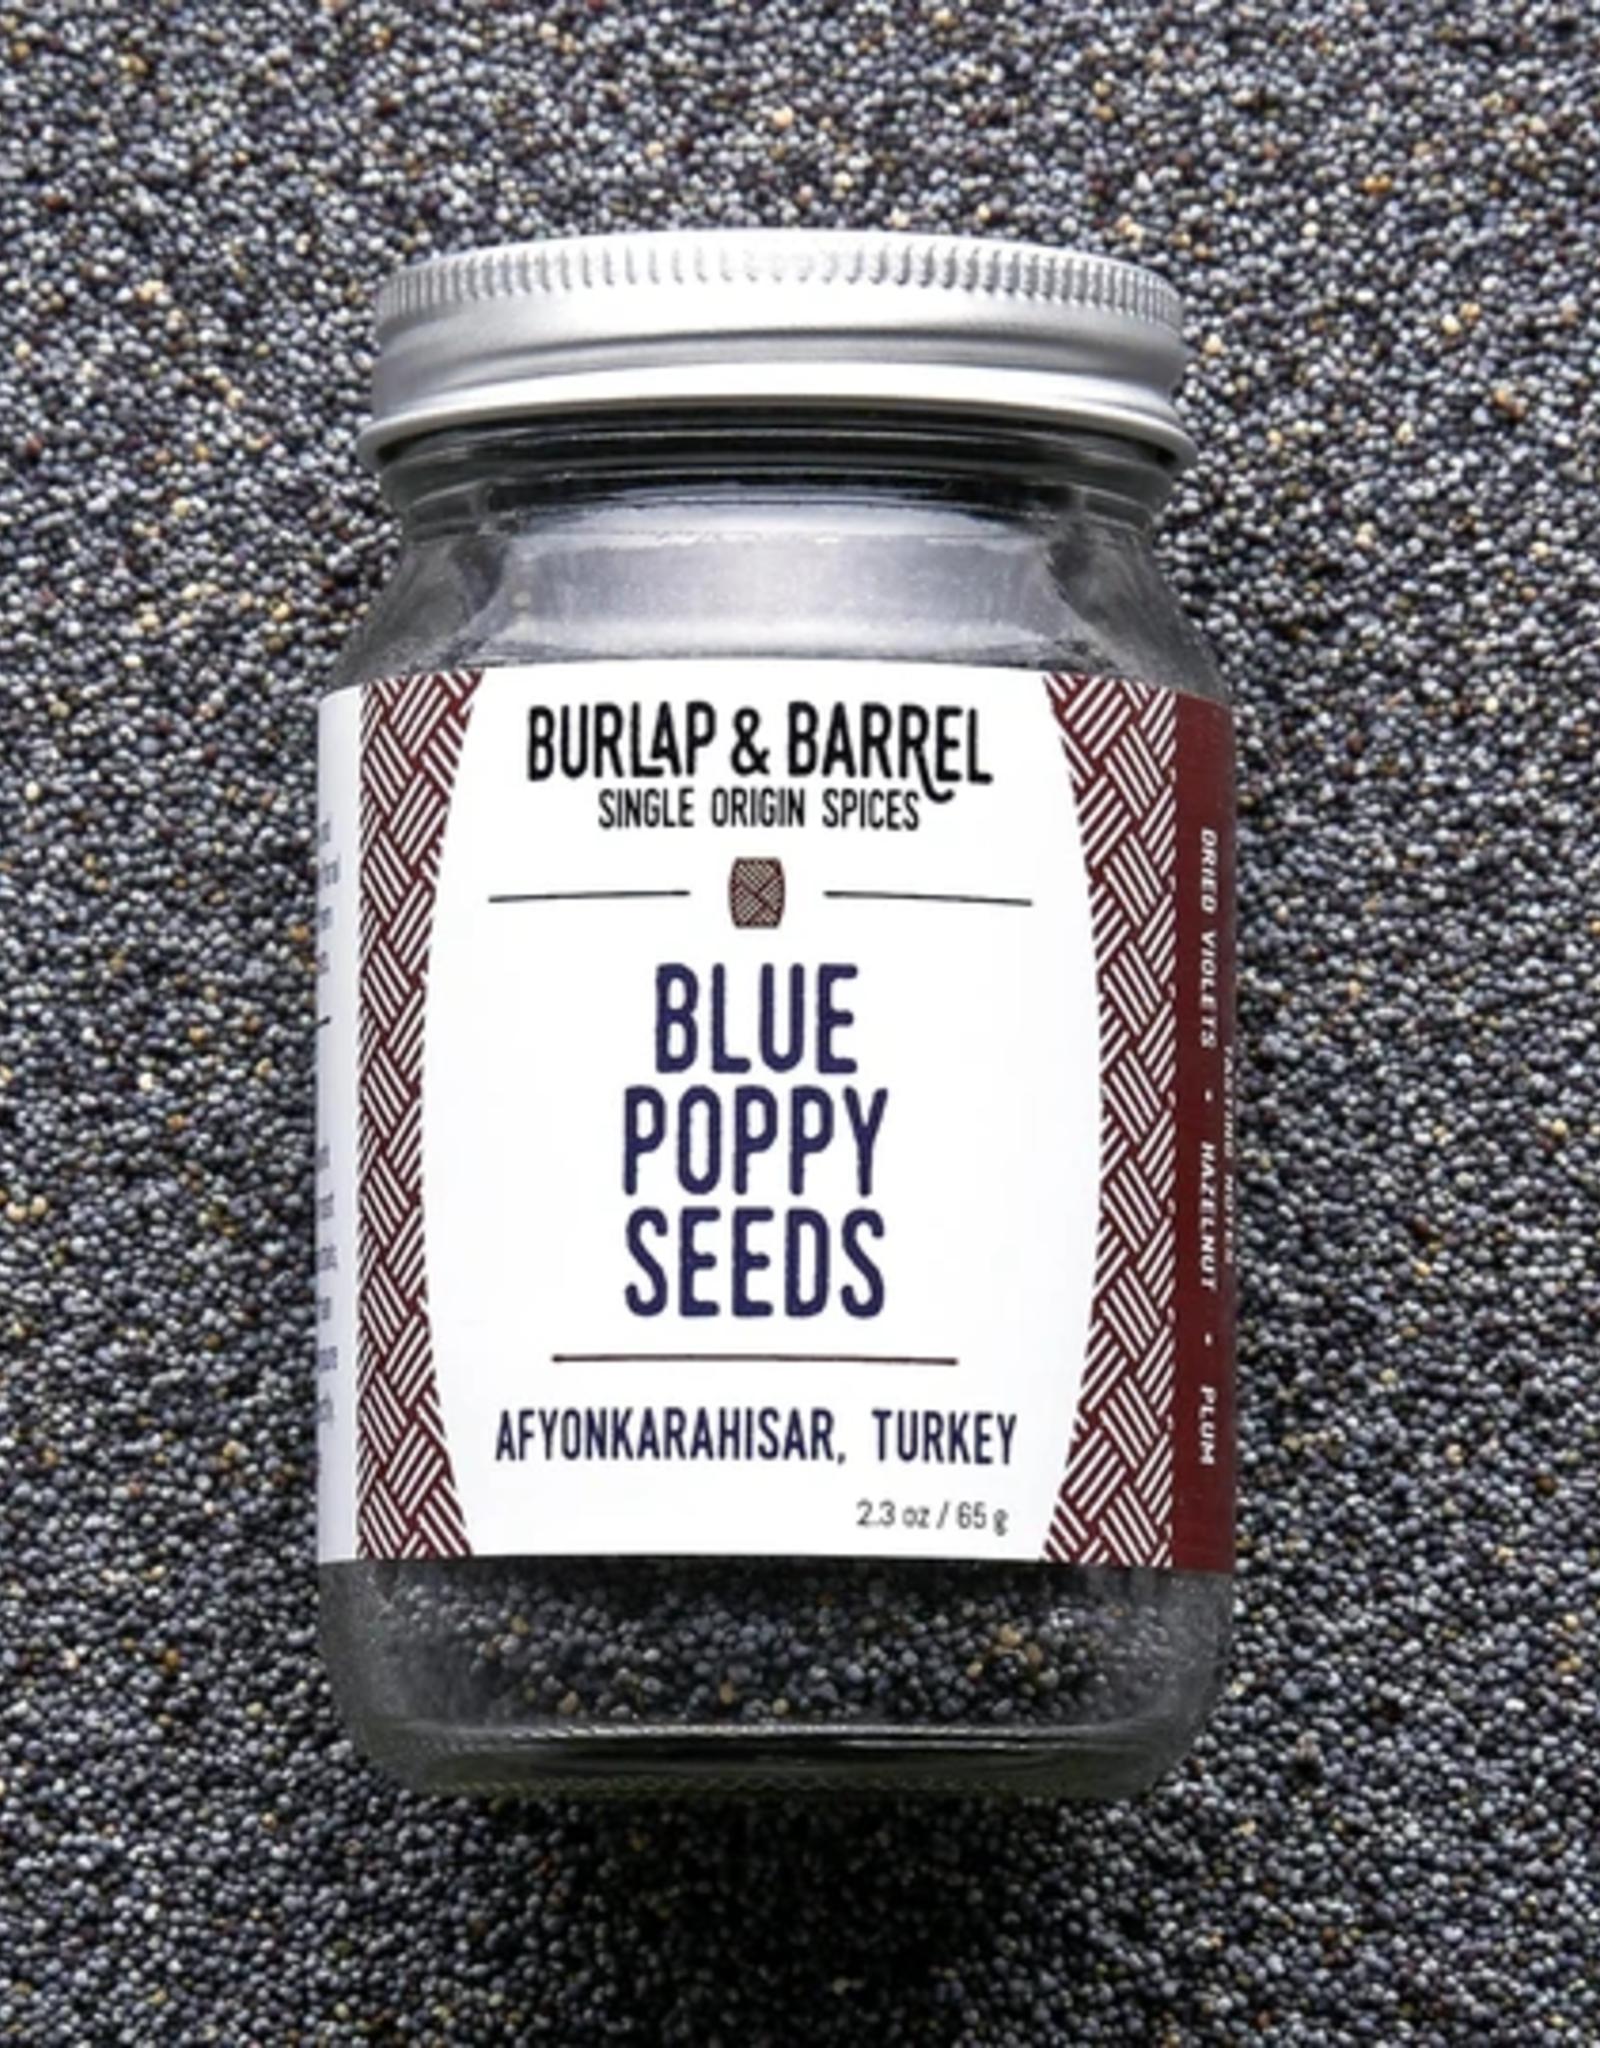 Burlap & Barrel Blue Poppy Seed